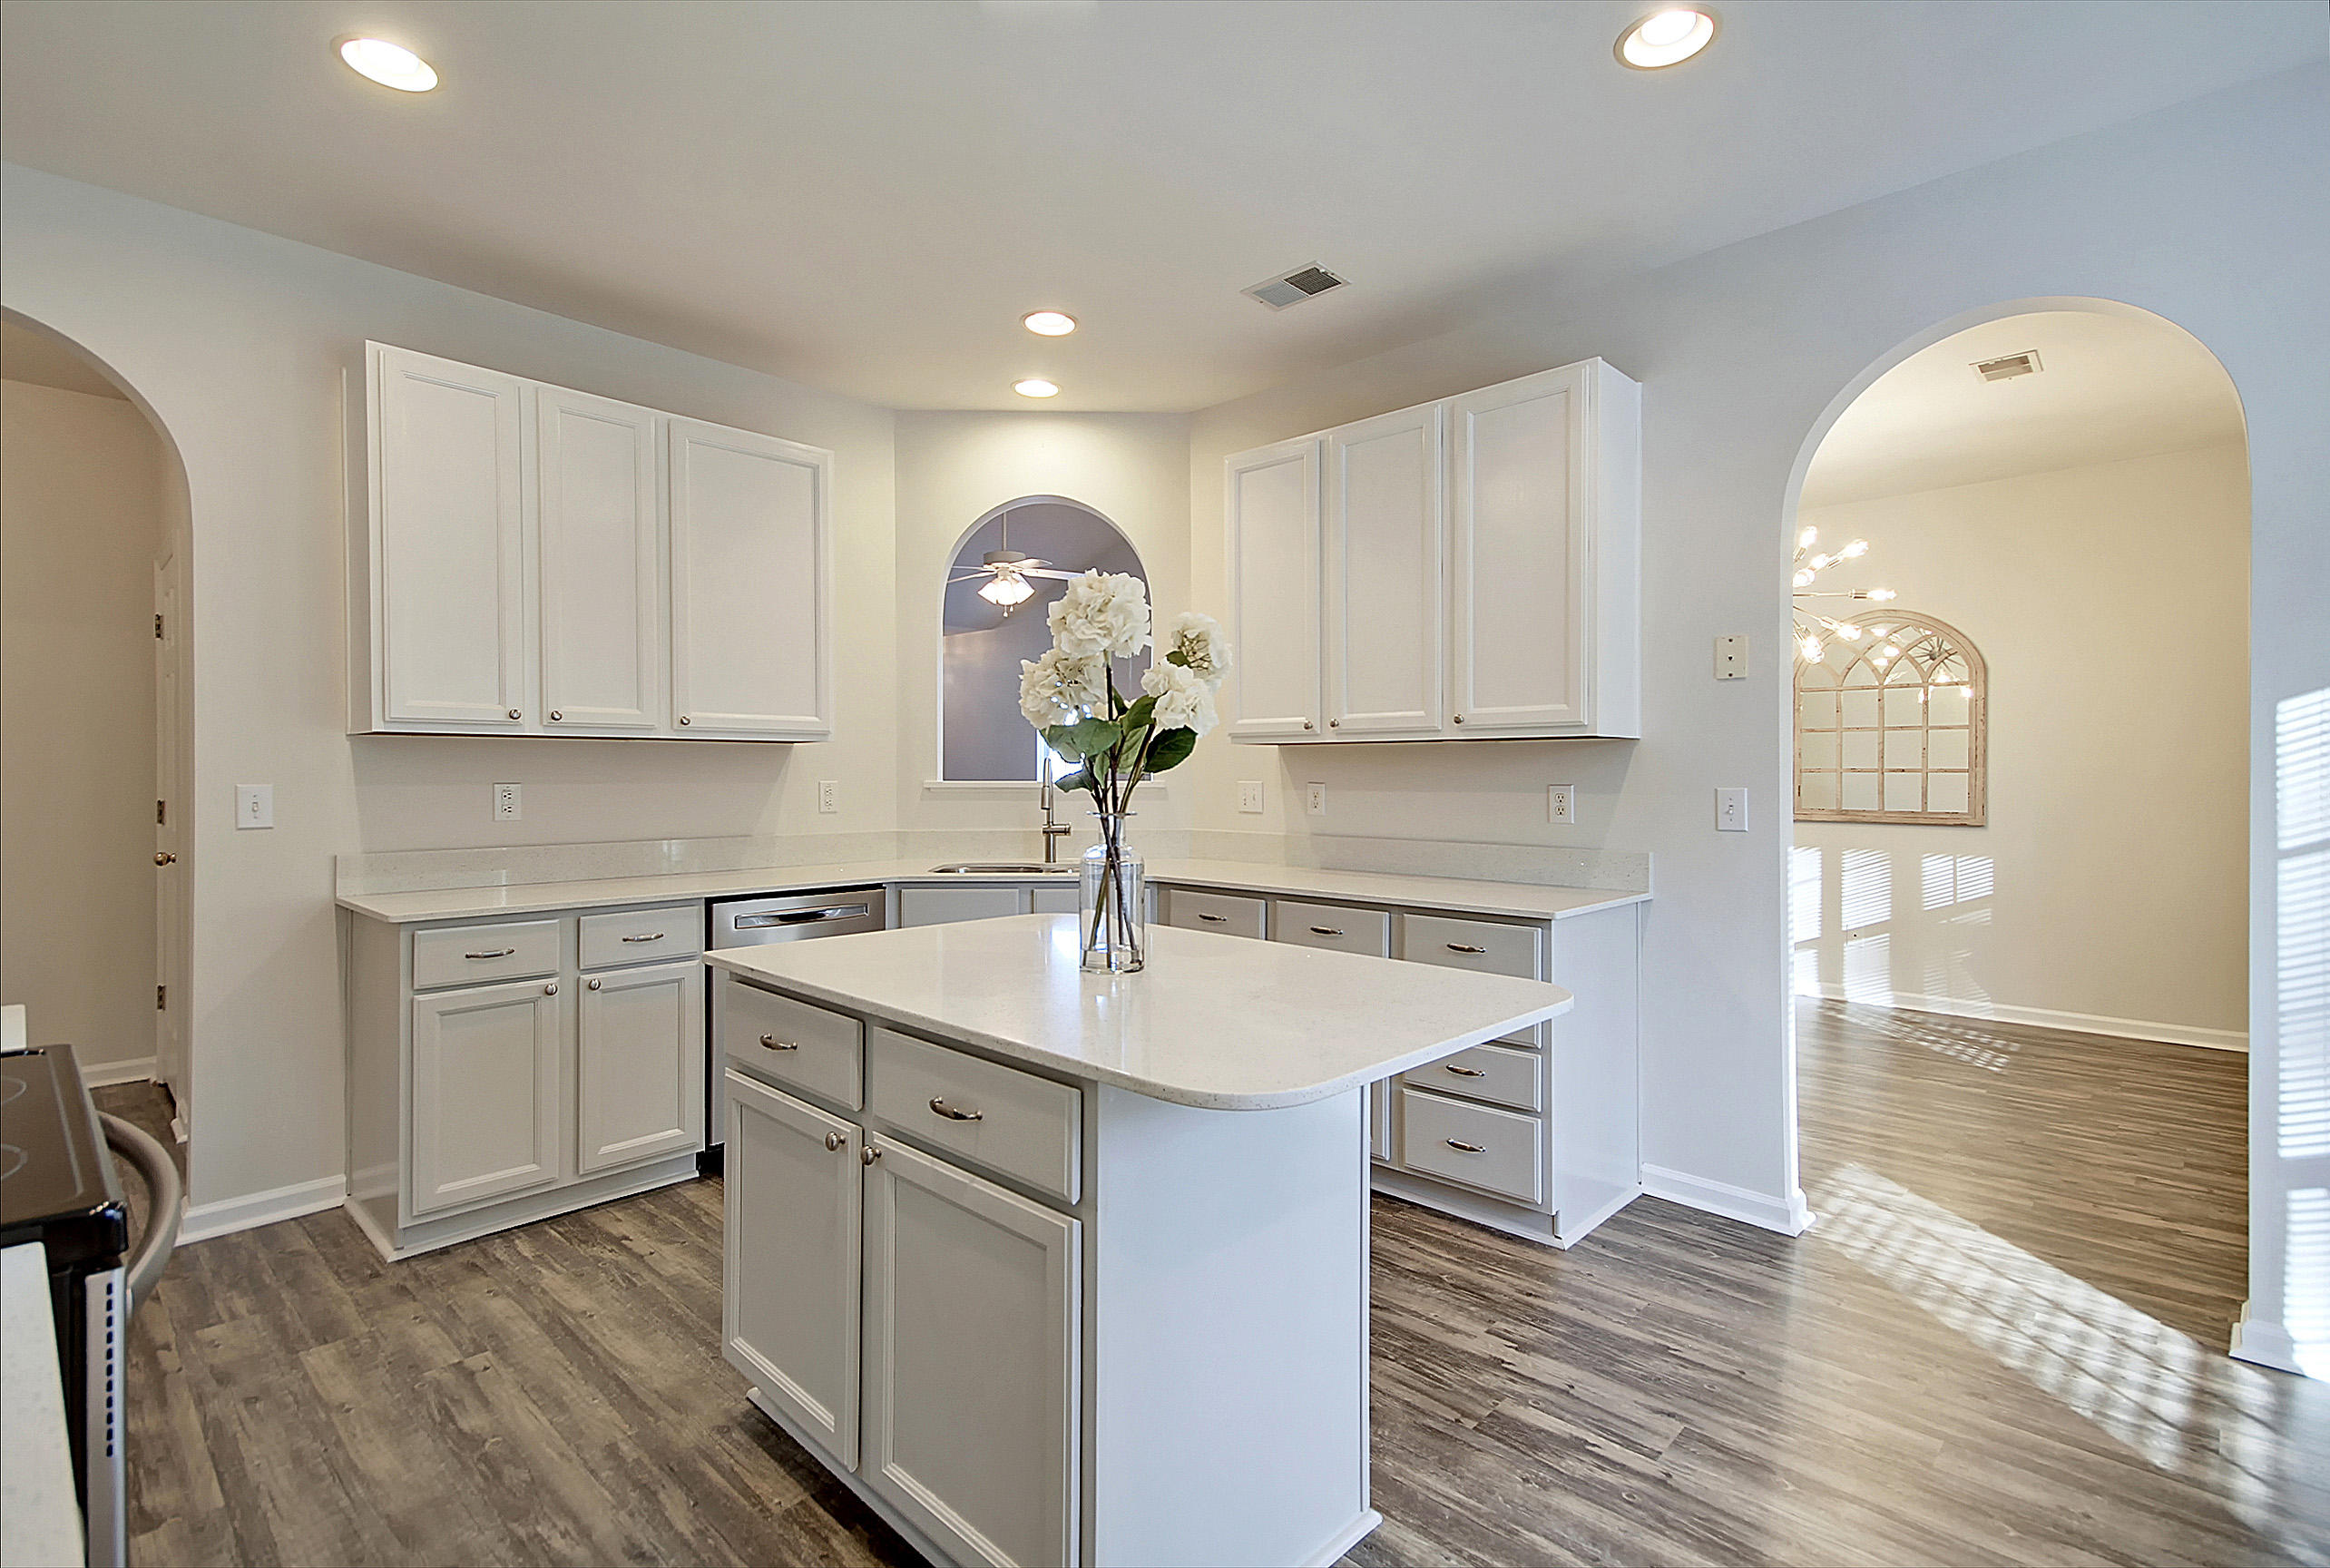 Dunes West Homes For Sale - 2656 Palmetto Hall, Mount Pleasant, SC - 0